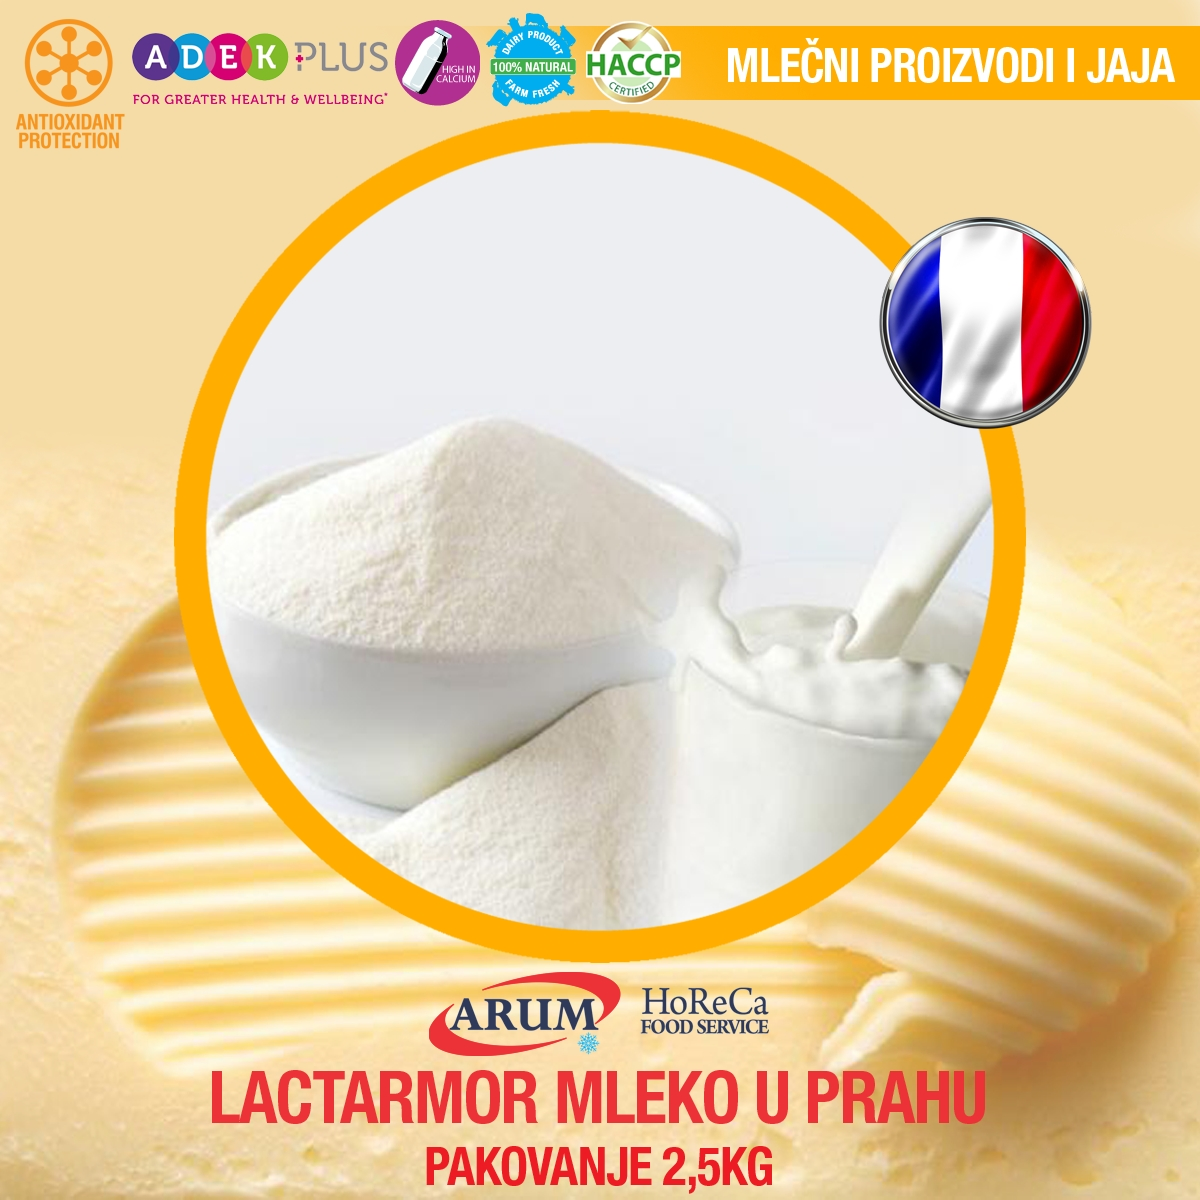 Lactarmor mleko u prahu 2.5 kg